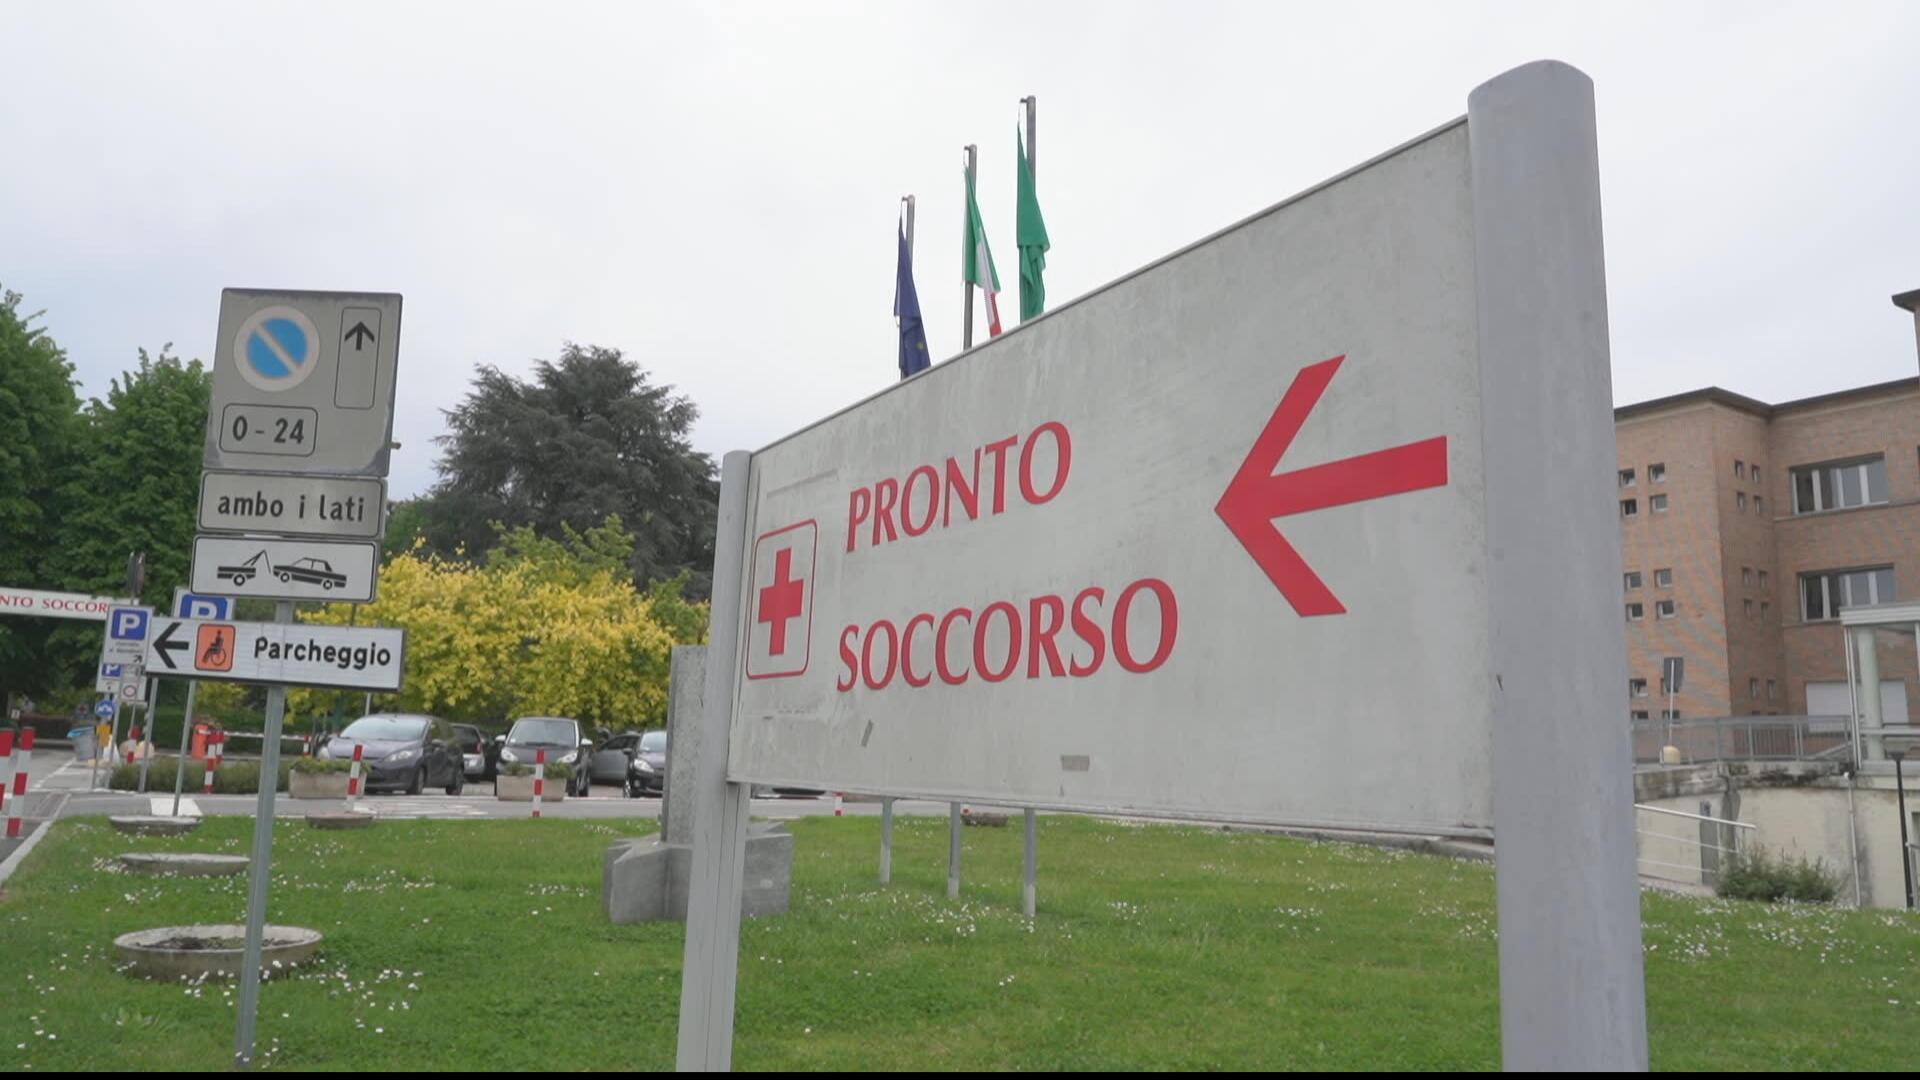 EN BILLET RETOUR PKG ITALIE CODOGNO NO MIX_frame_2334